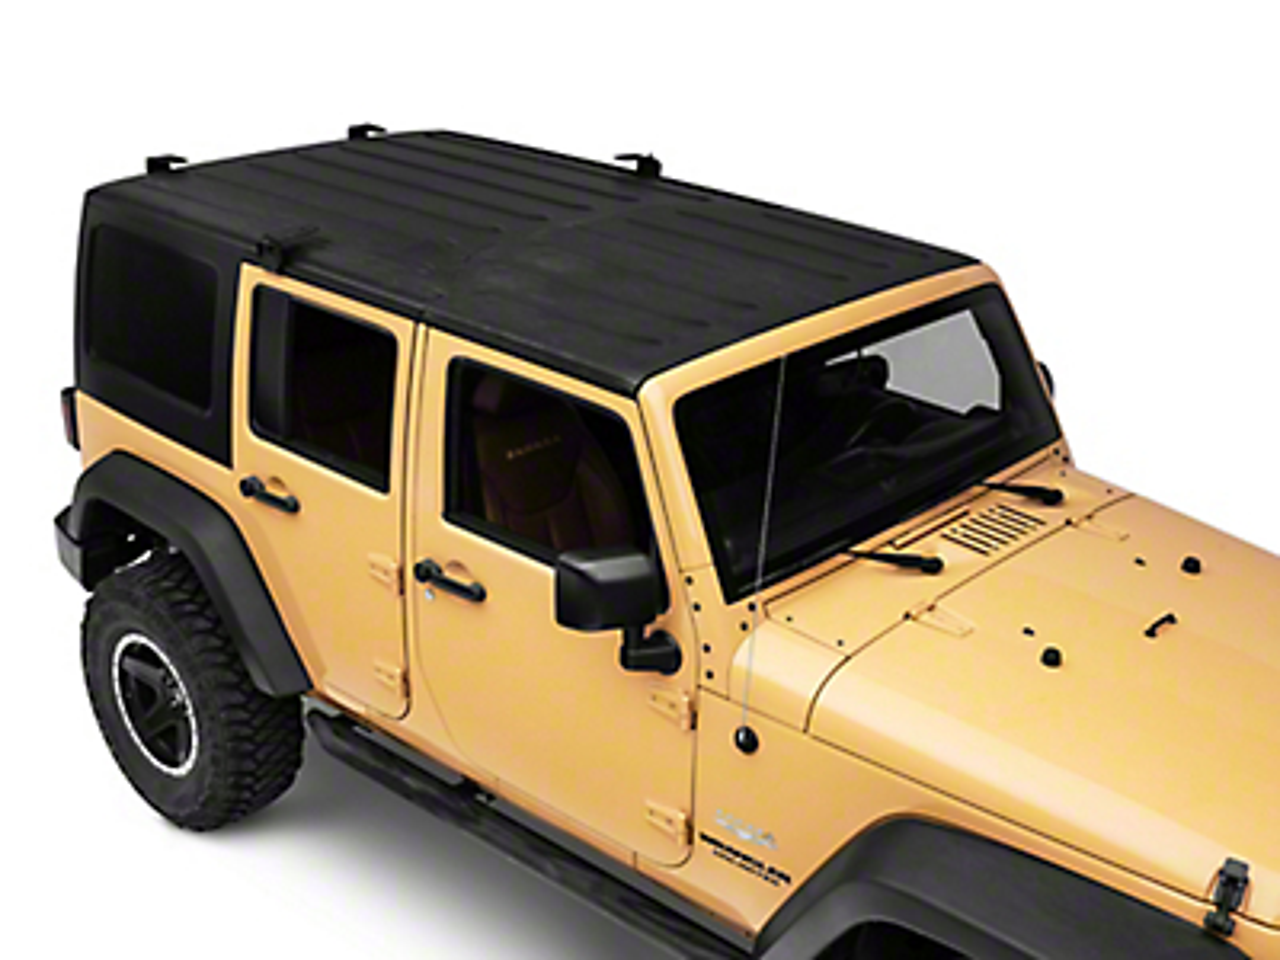 Smittybilt Defender Rack Roof Mounting Kit (07-18 Jeep Wrangler JK w/ Factory Hard Top)